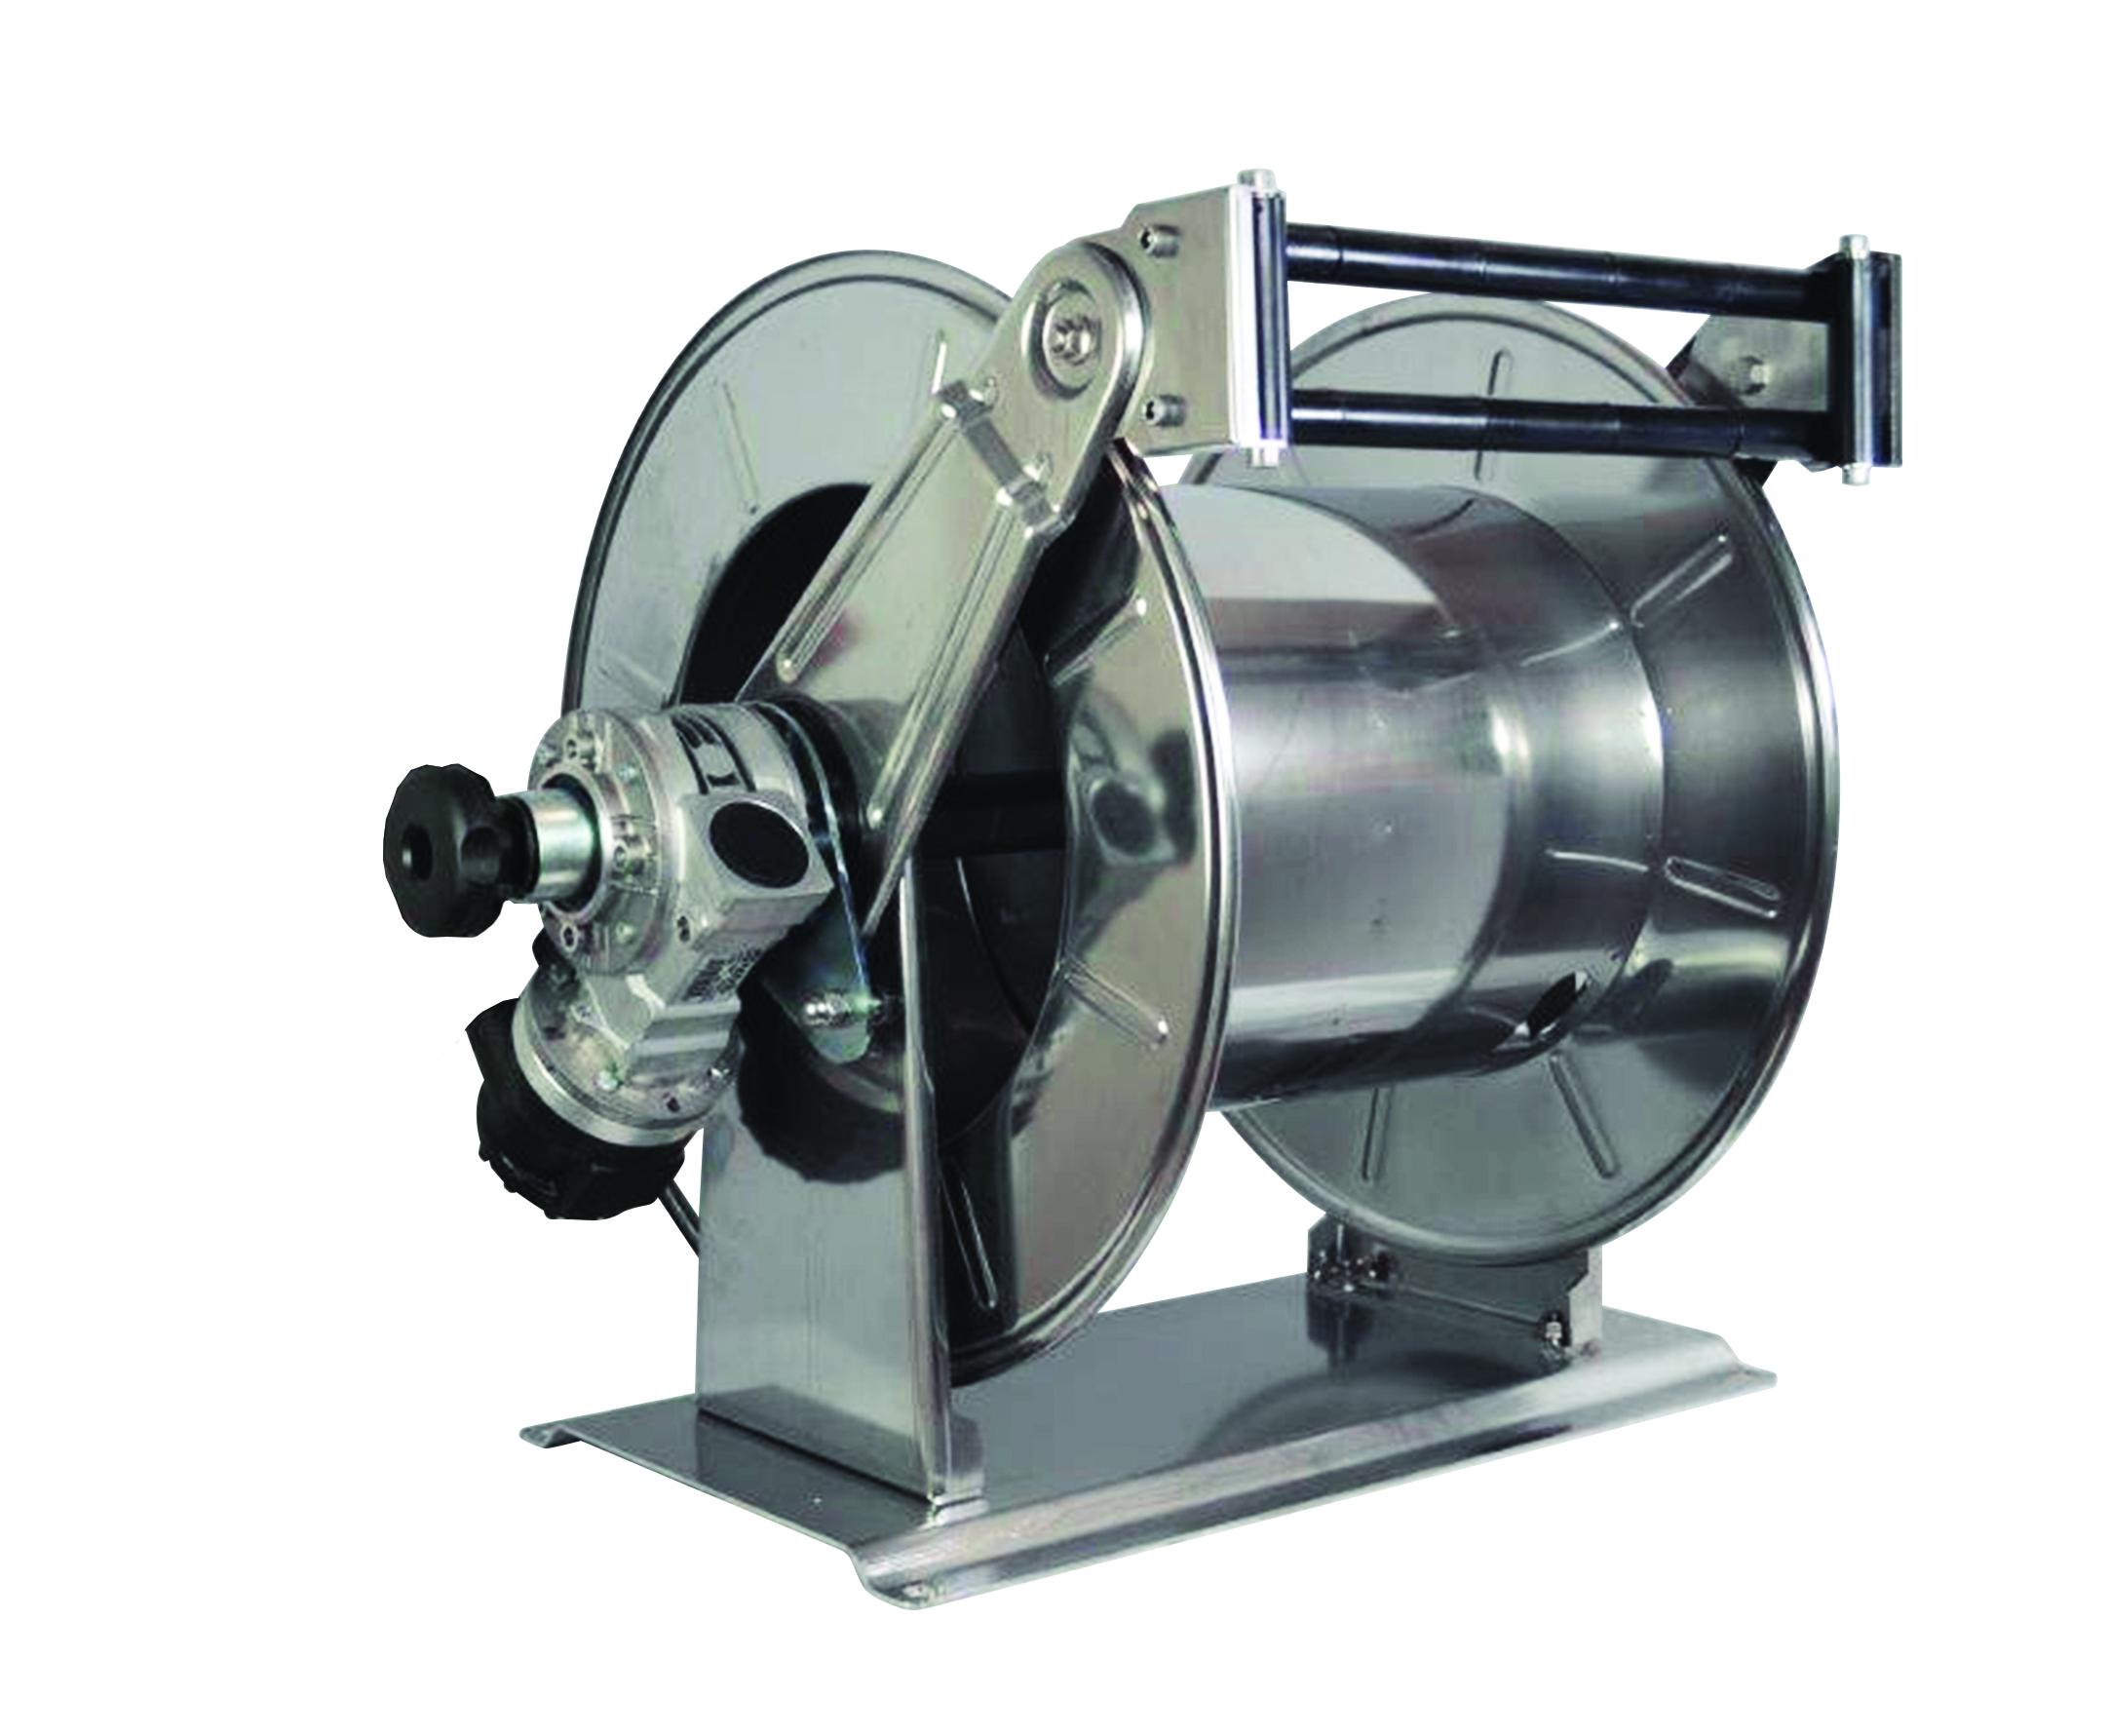 AVPN 0 - Pneumatic Motor Driven hose reels